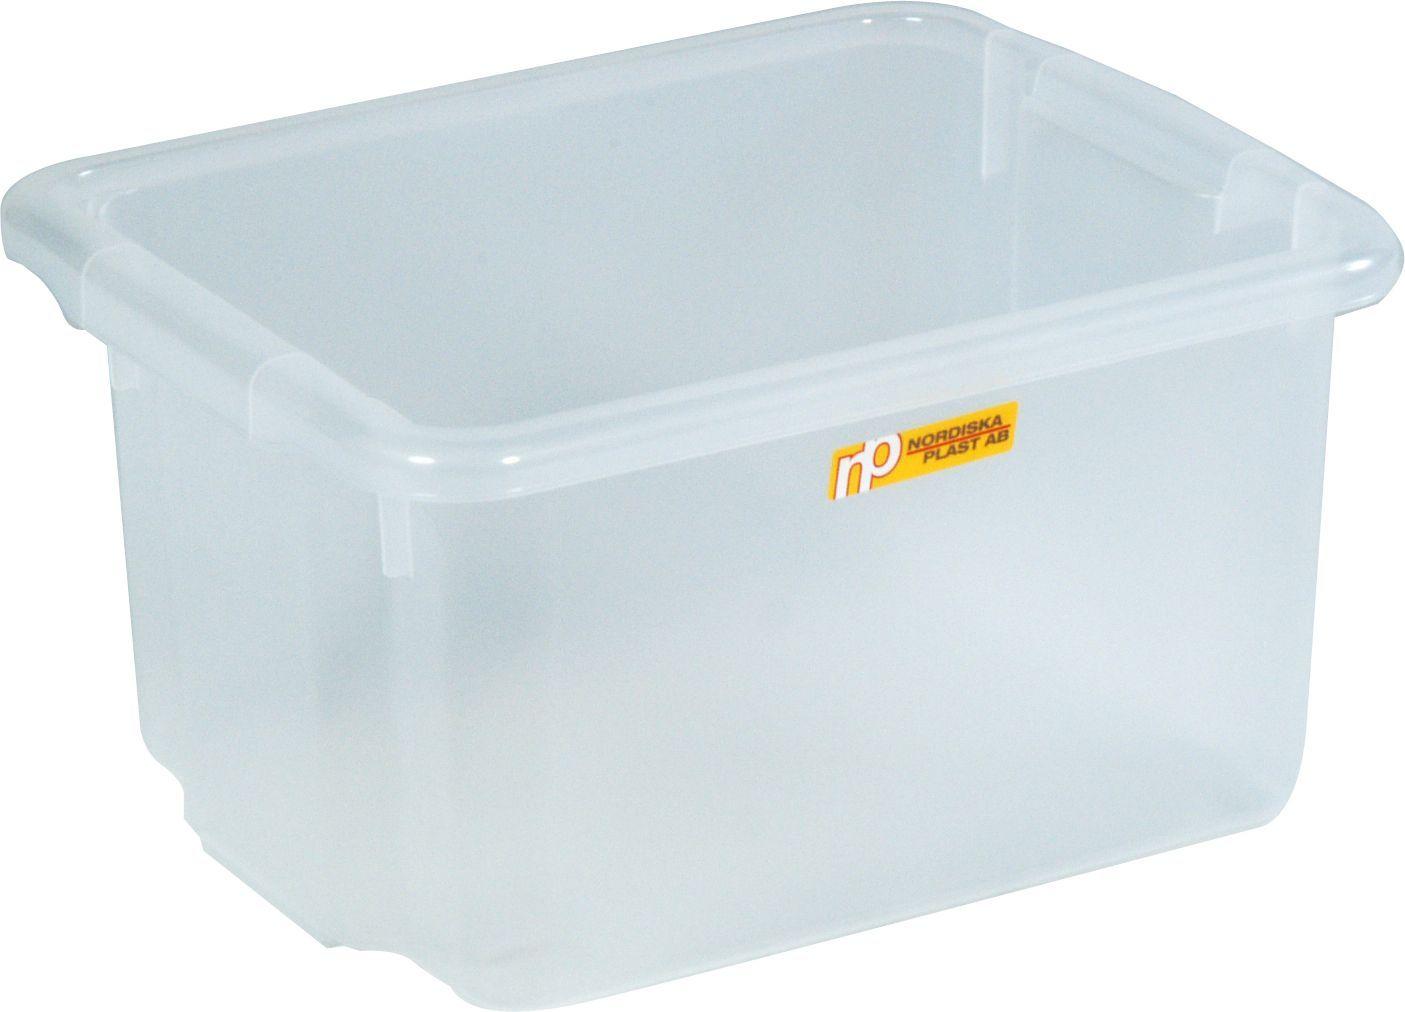 Oppbevaringsboks 23L transparent plast 72600500